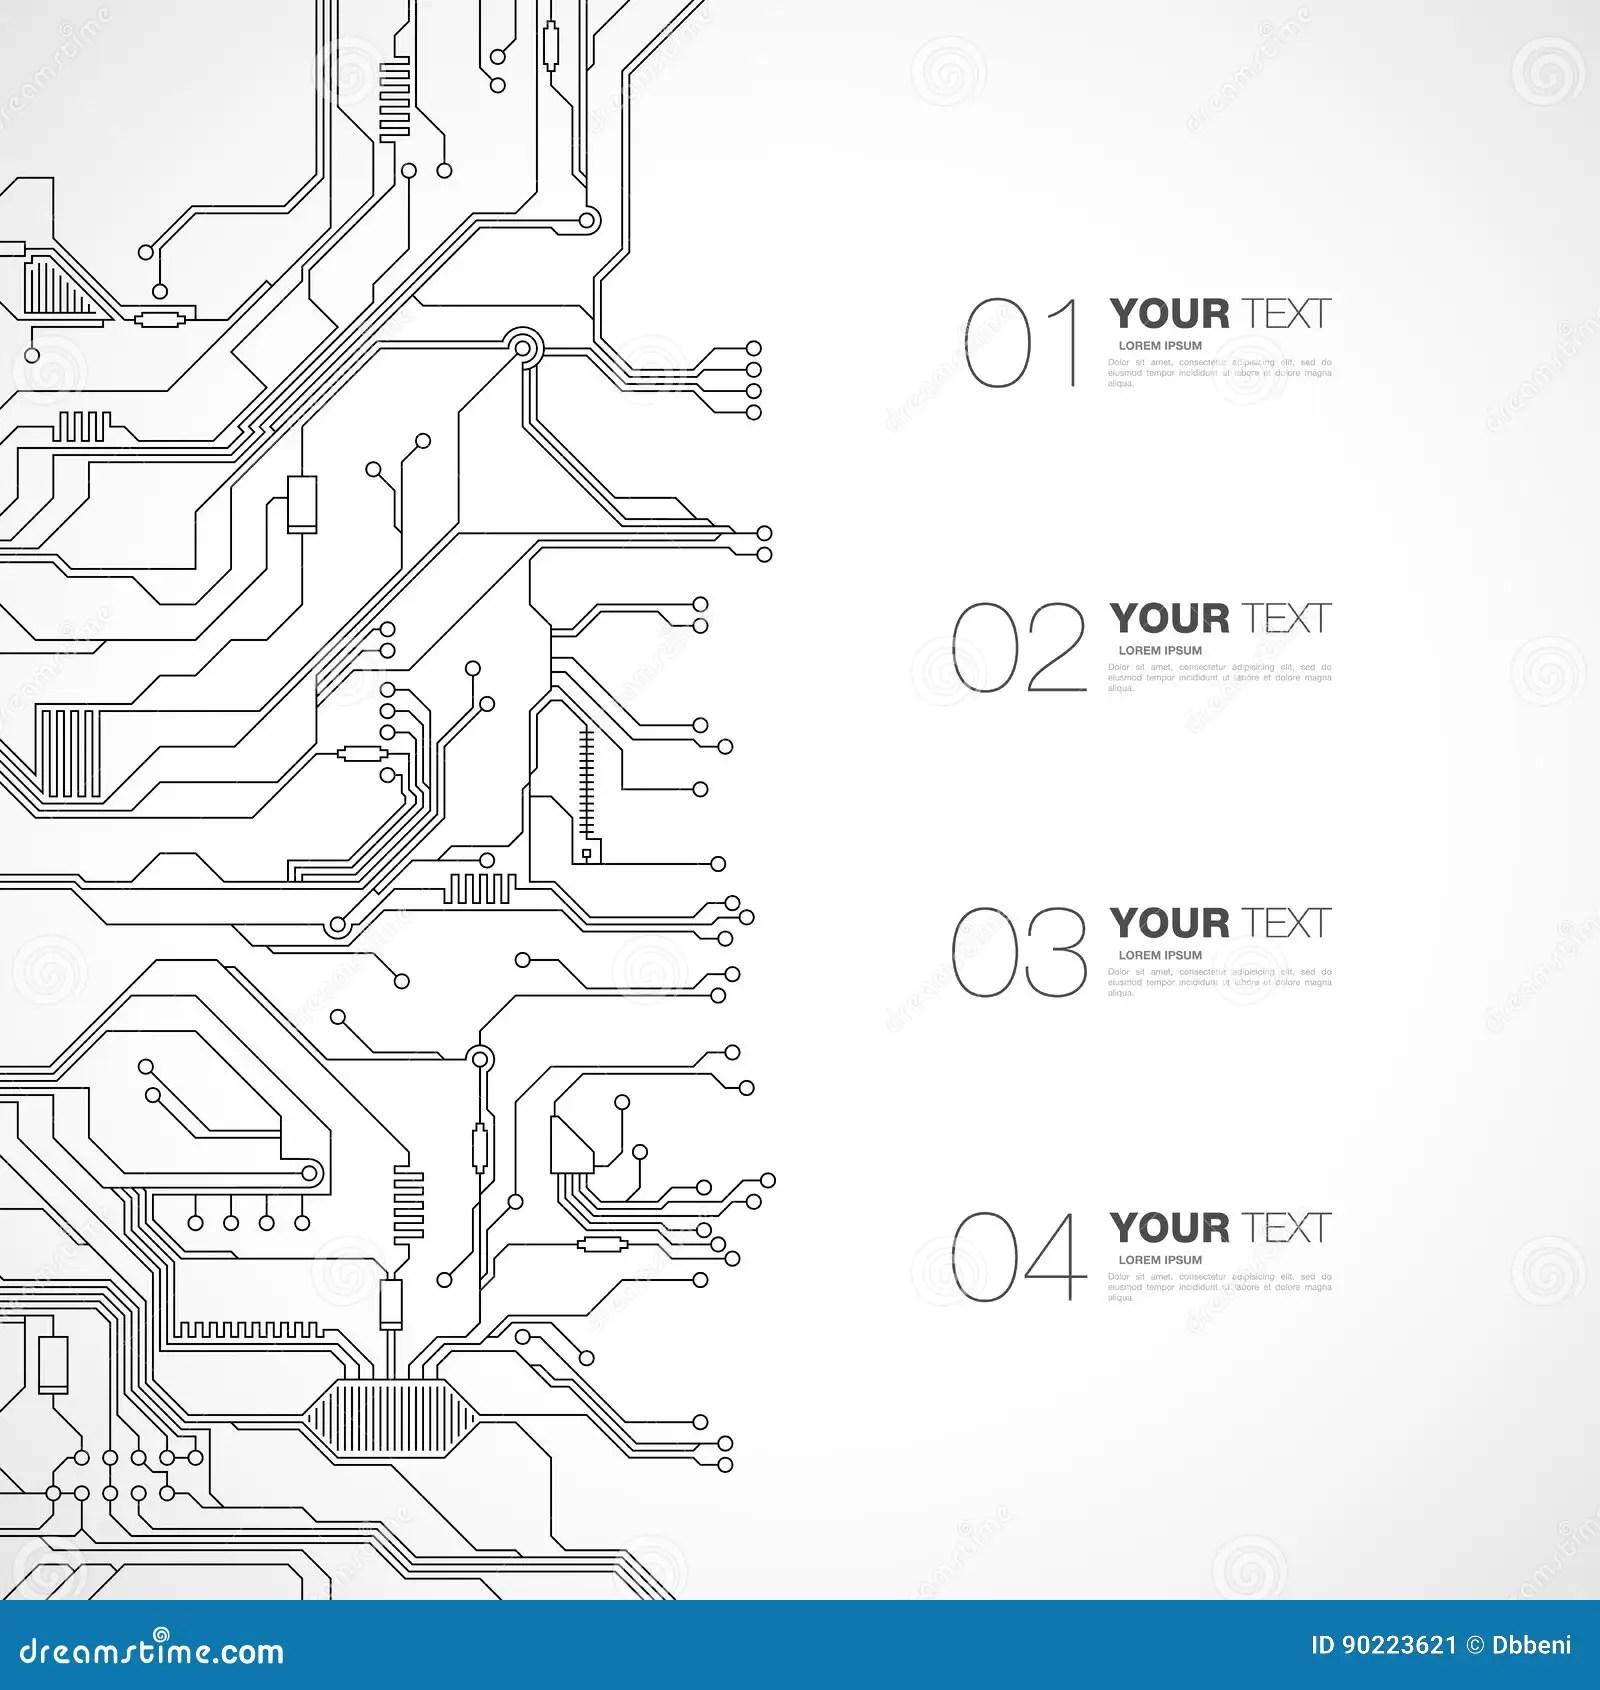 Detailed Printed Circuit Board Design Stock Vector